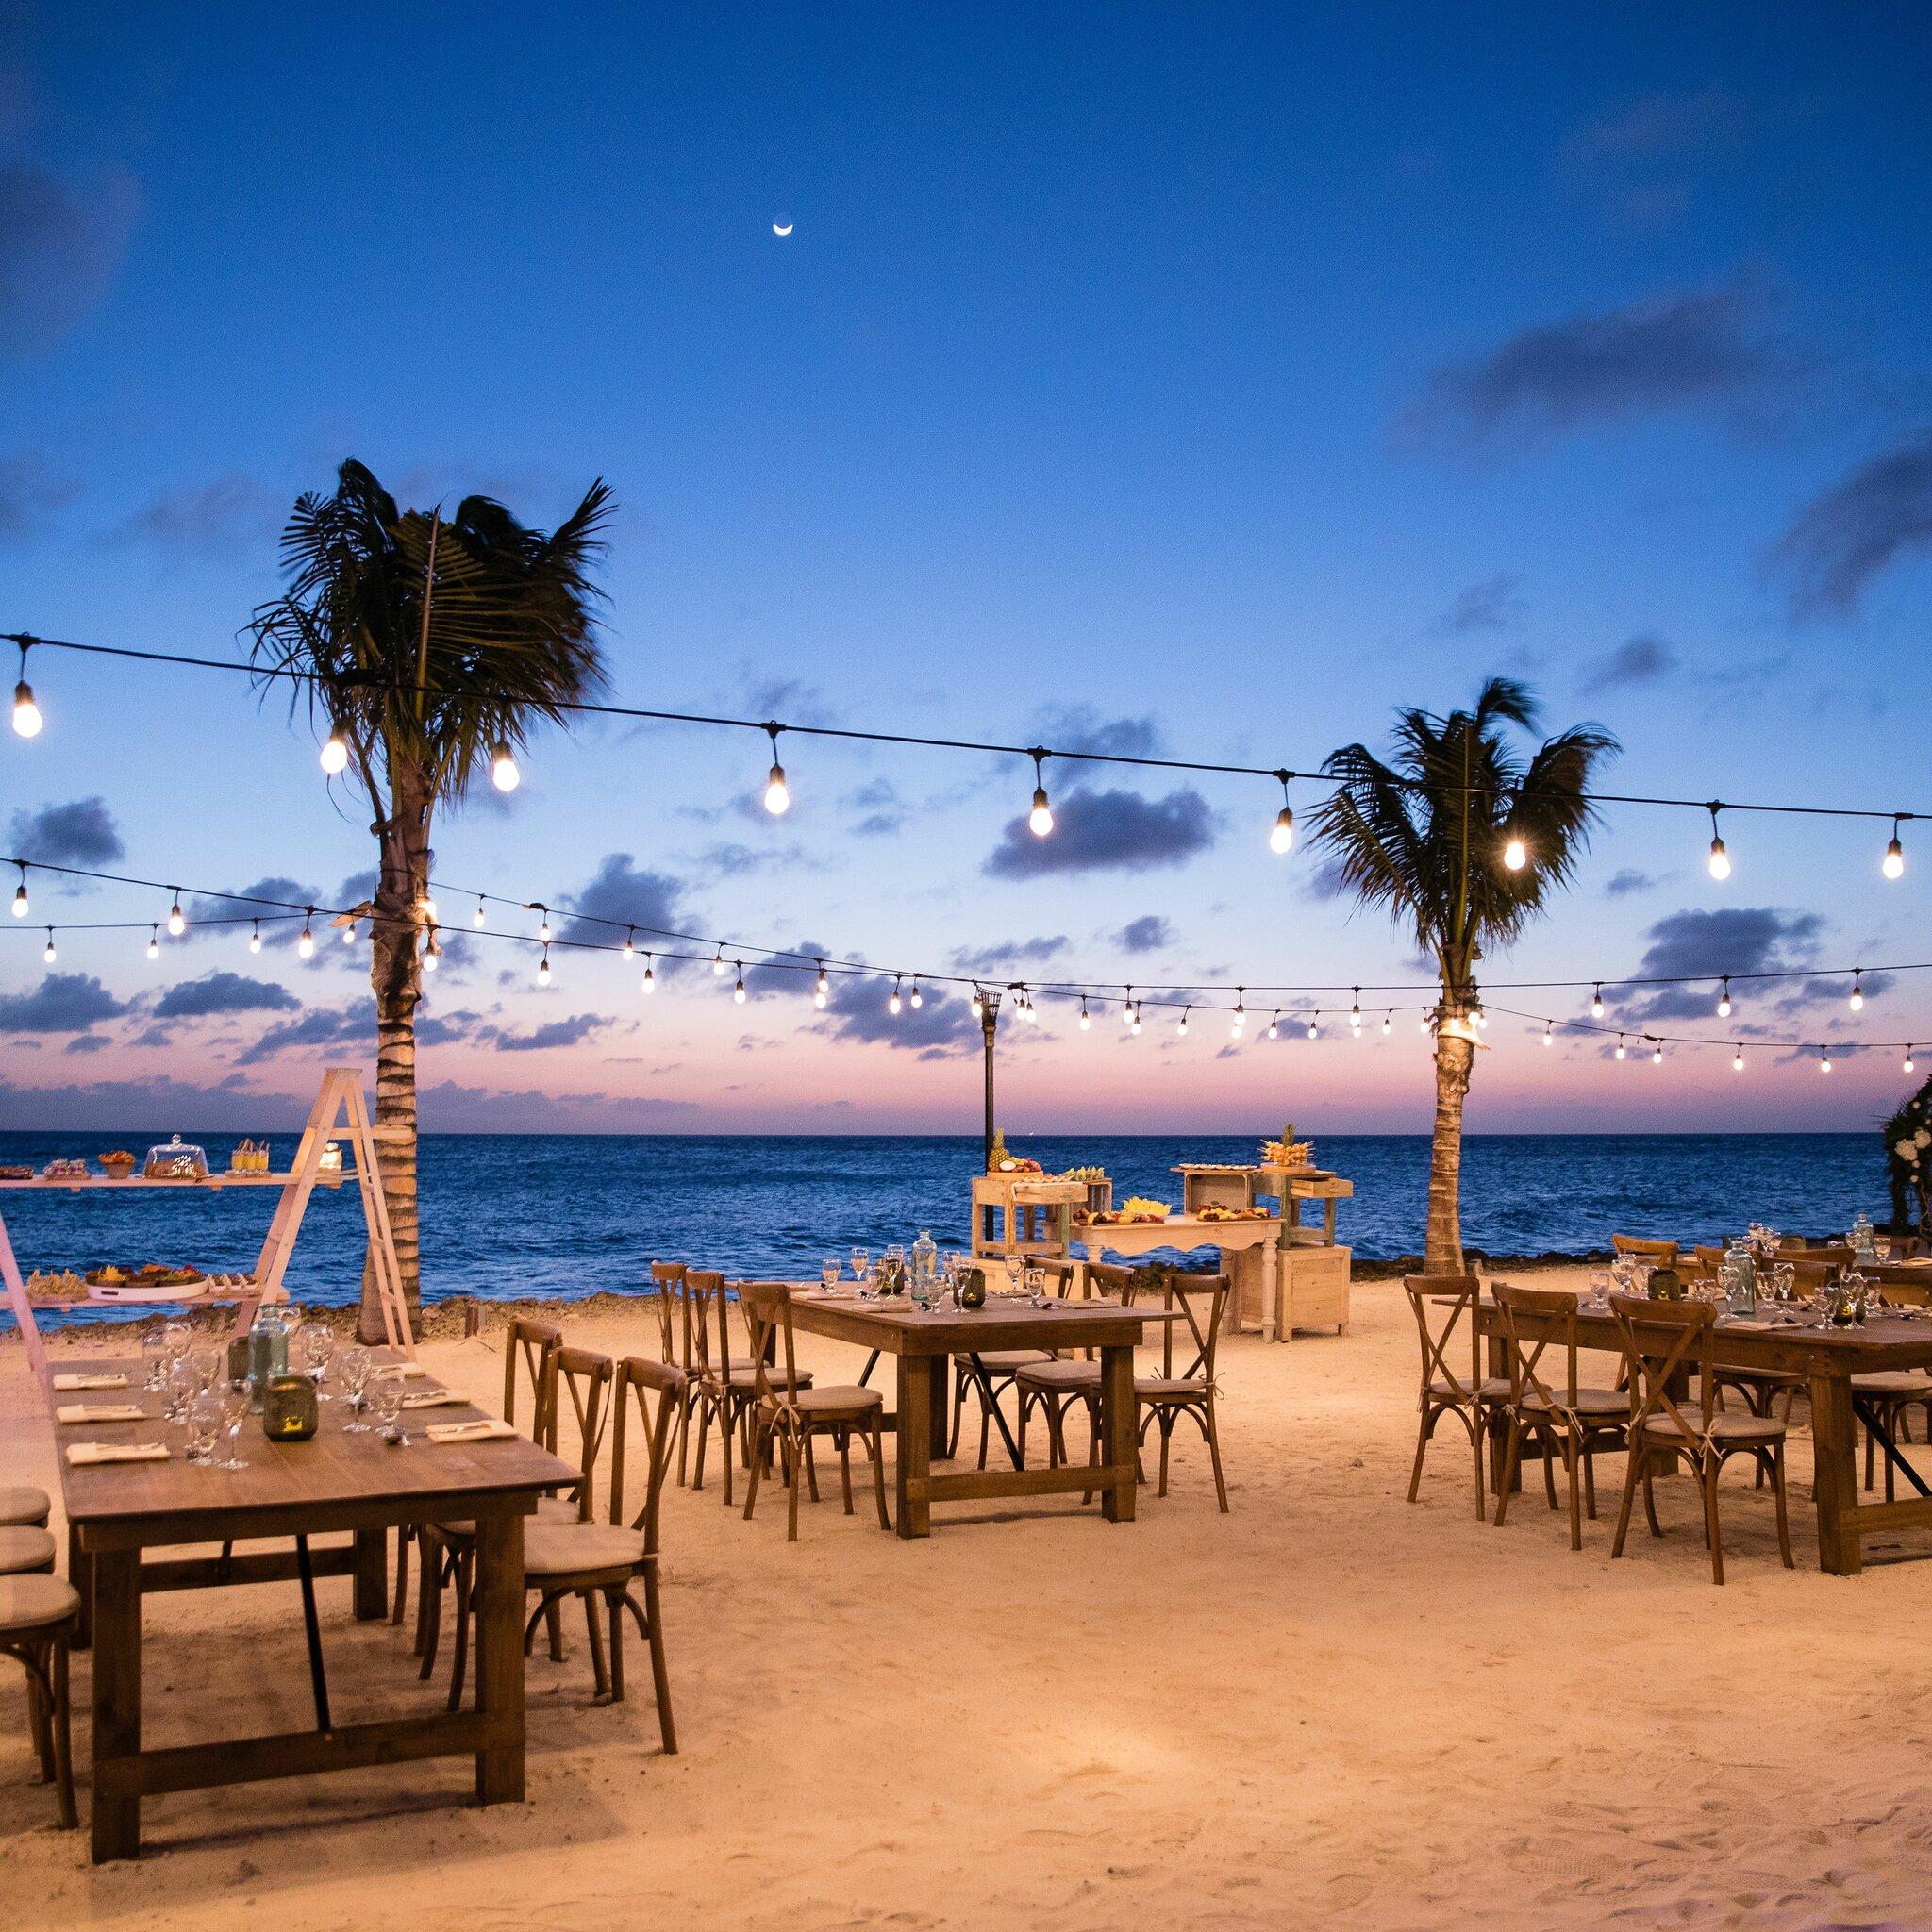 Private Island Beaches: Renaissance Island, Aruba